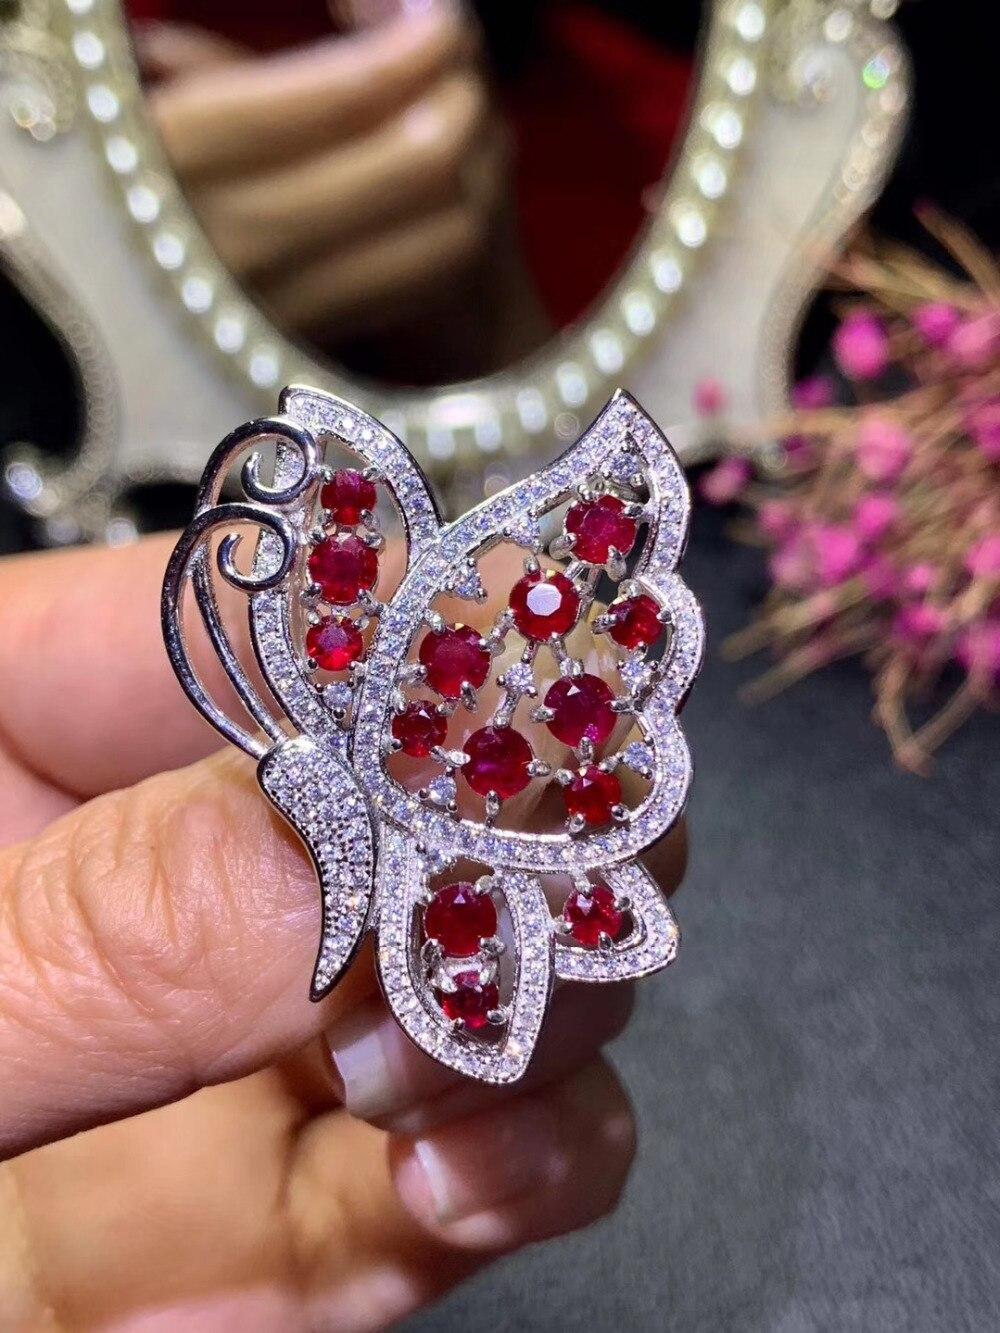 Broches de GEMA de rubí rojo Natural colgante S925 broches de piedras preciosas naturales de plata moda grace mariposa novia boda joyería - 5